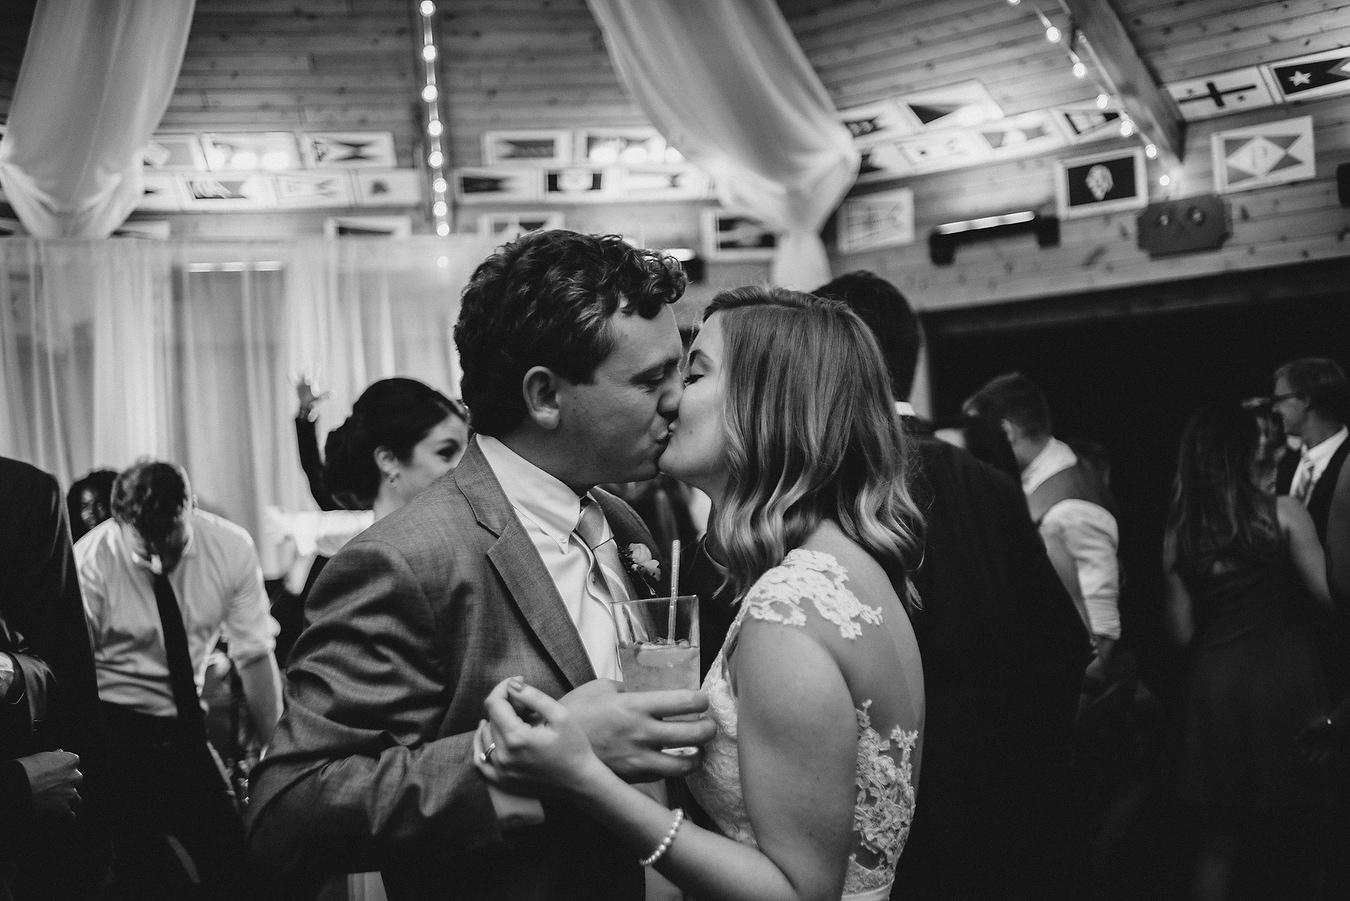 dance floor at the eastern yacht club